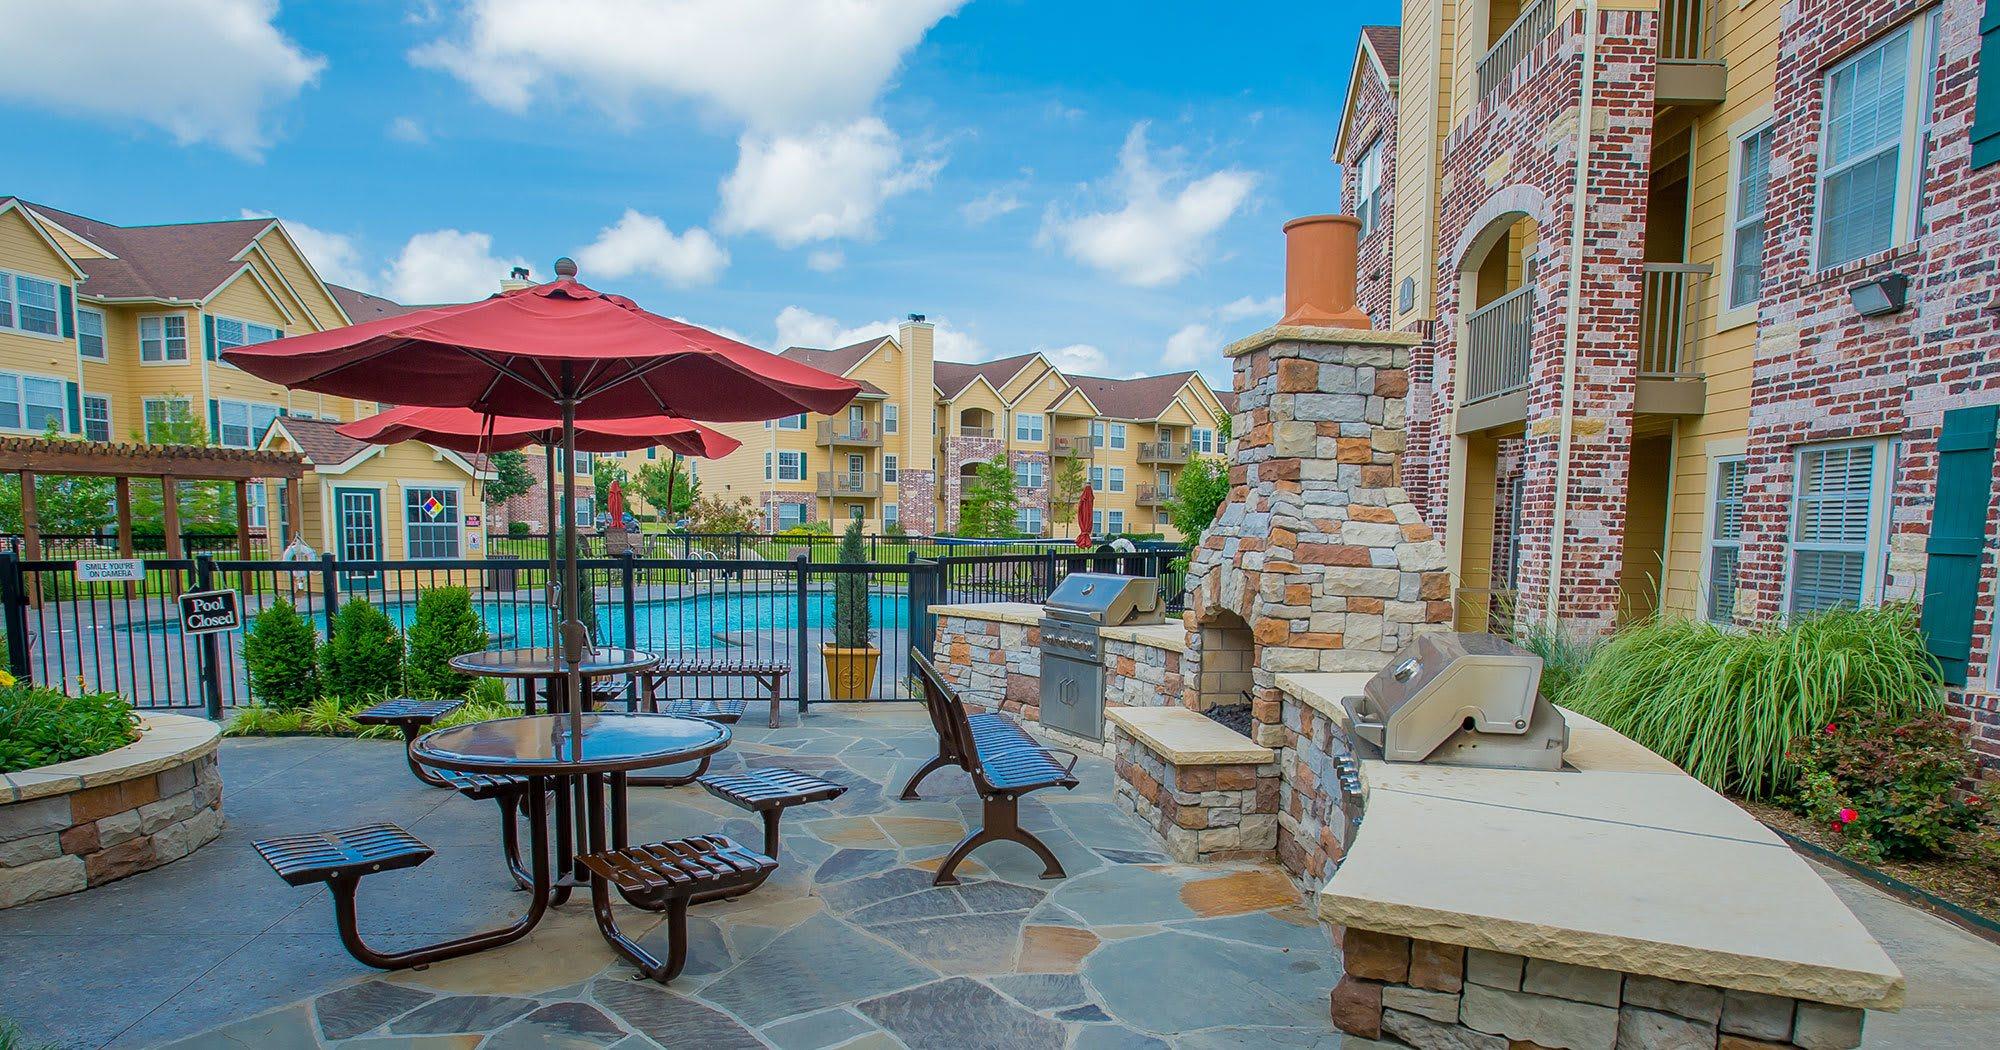 Swimming pool view at apartments in Broken Arrow